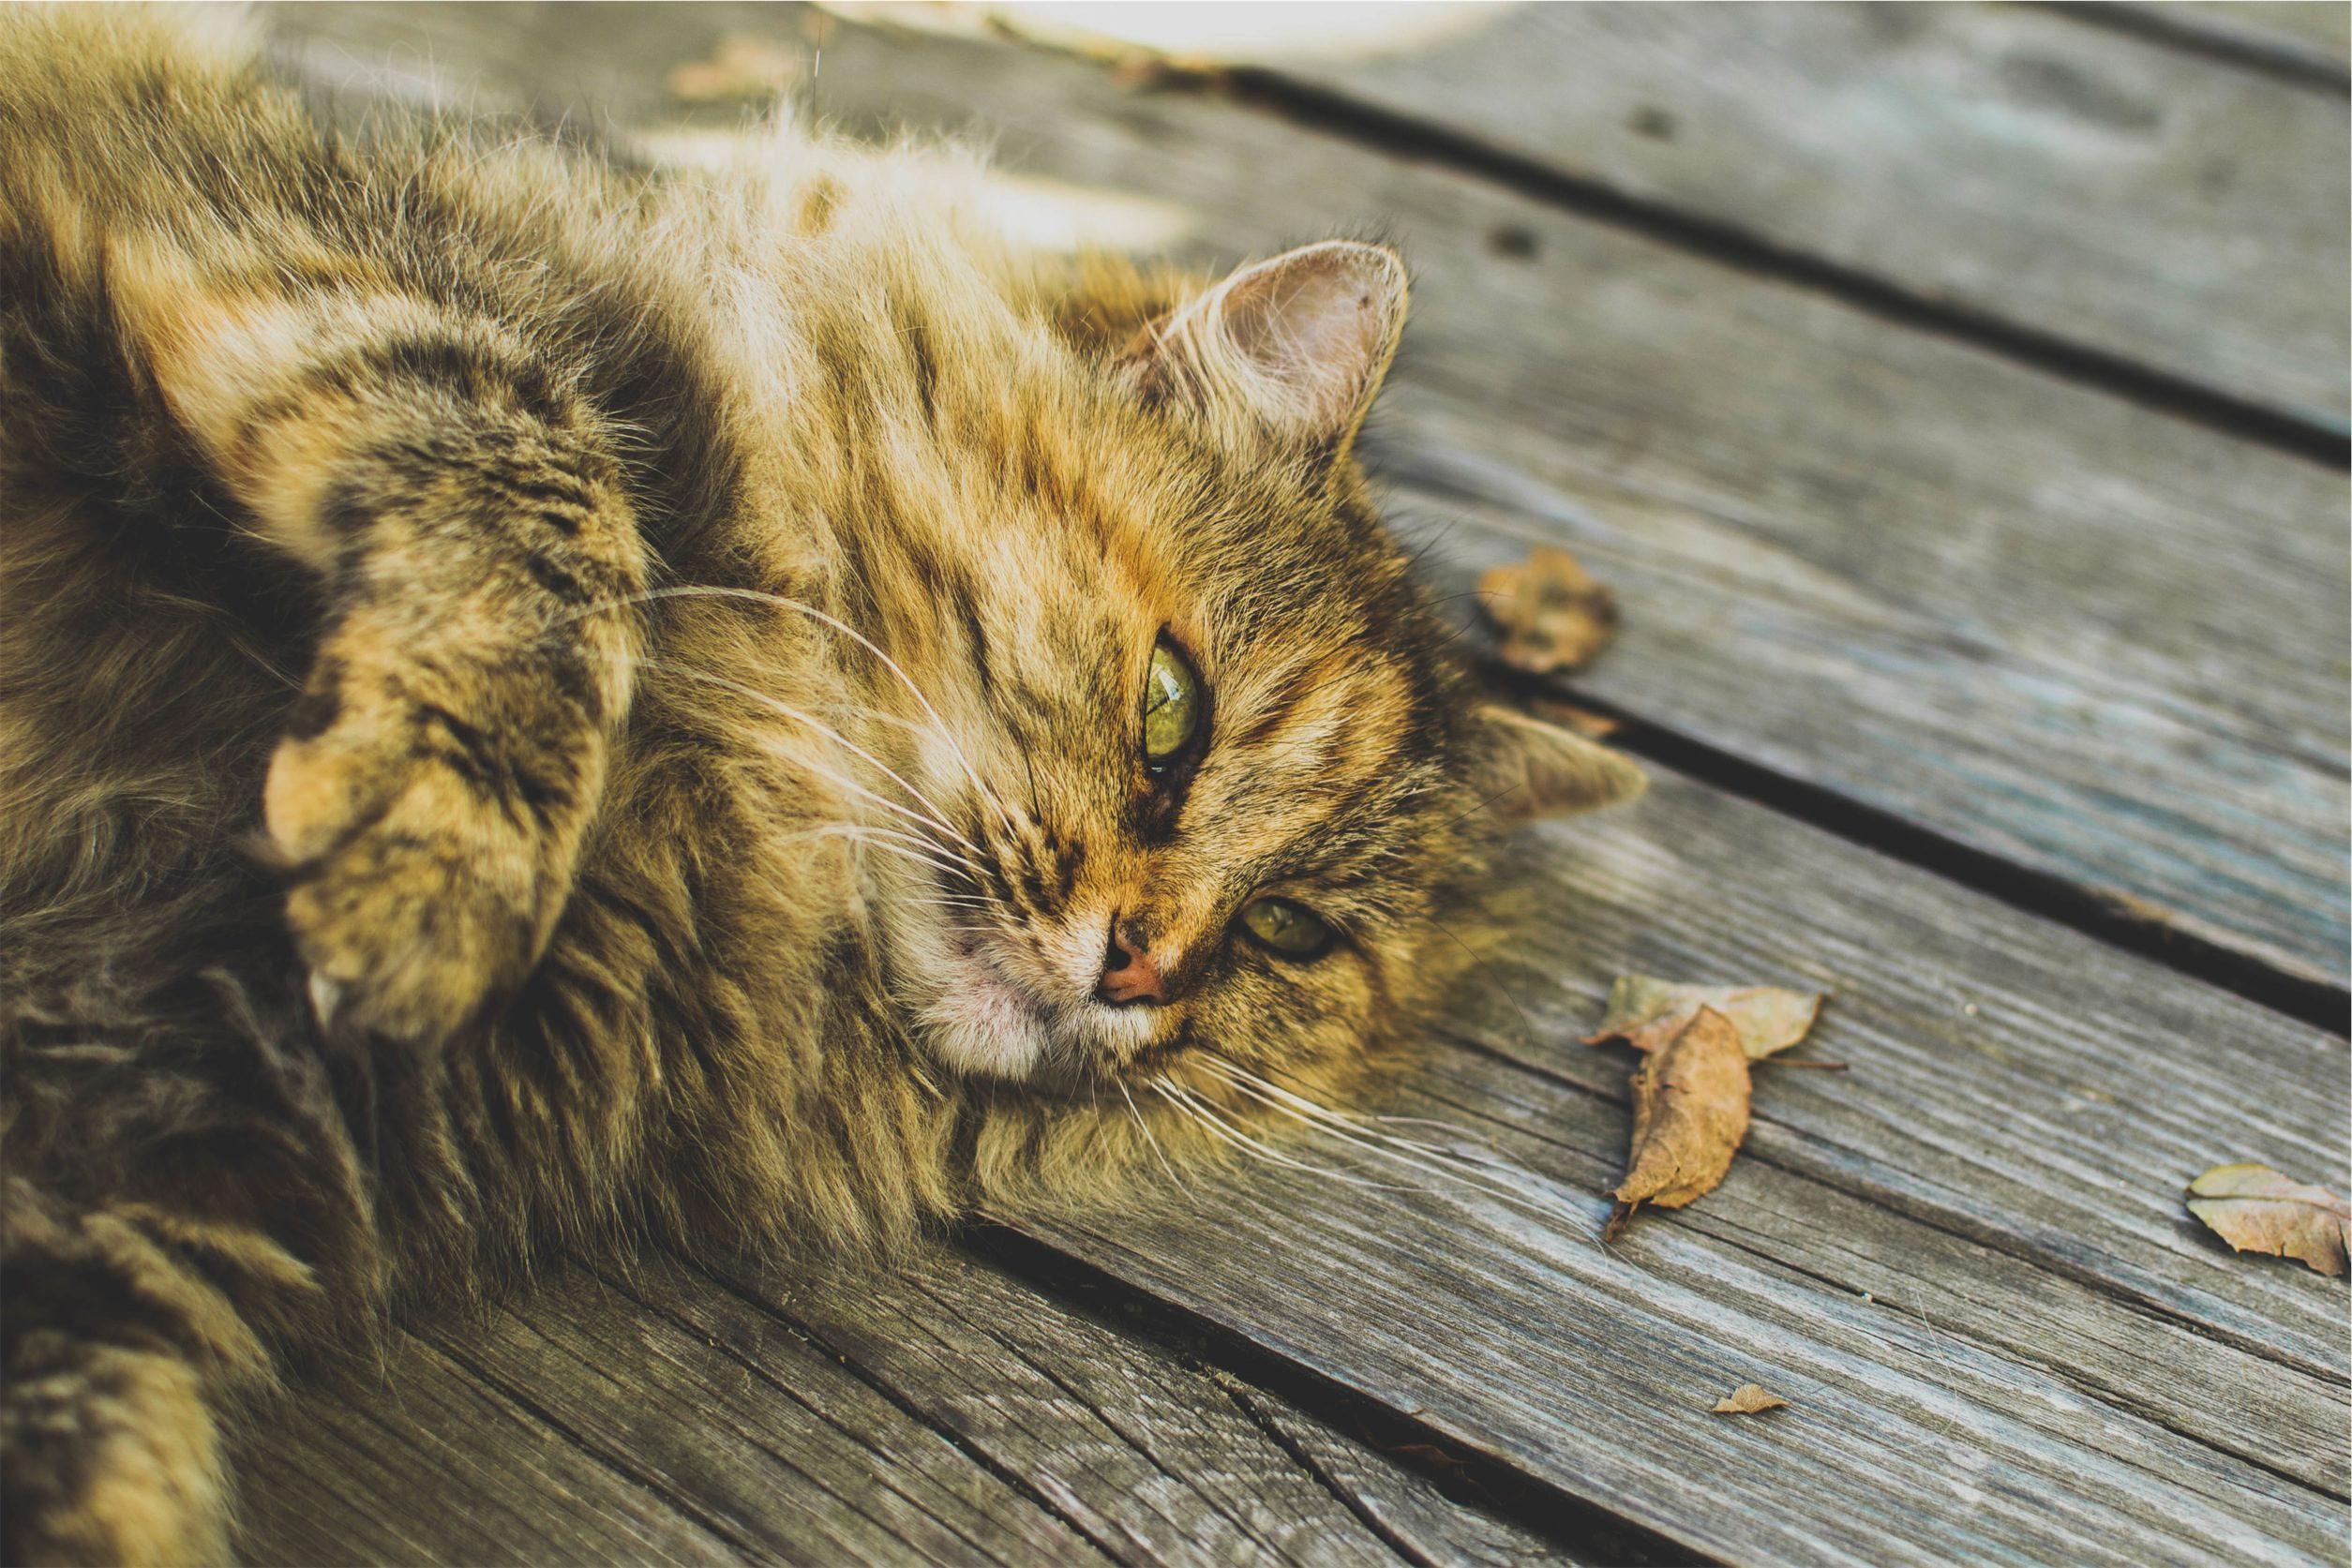 gato, relax, suelo, madera, mirada - Fondos de Pantalla HD - professor-falken.com